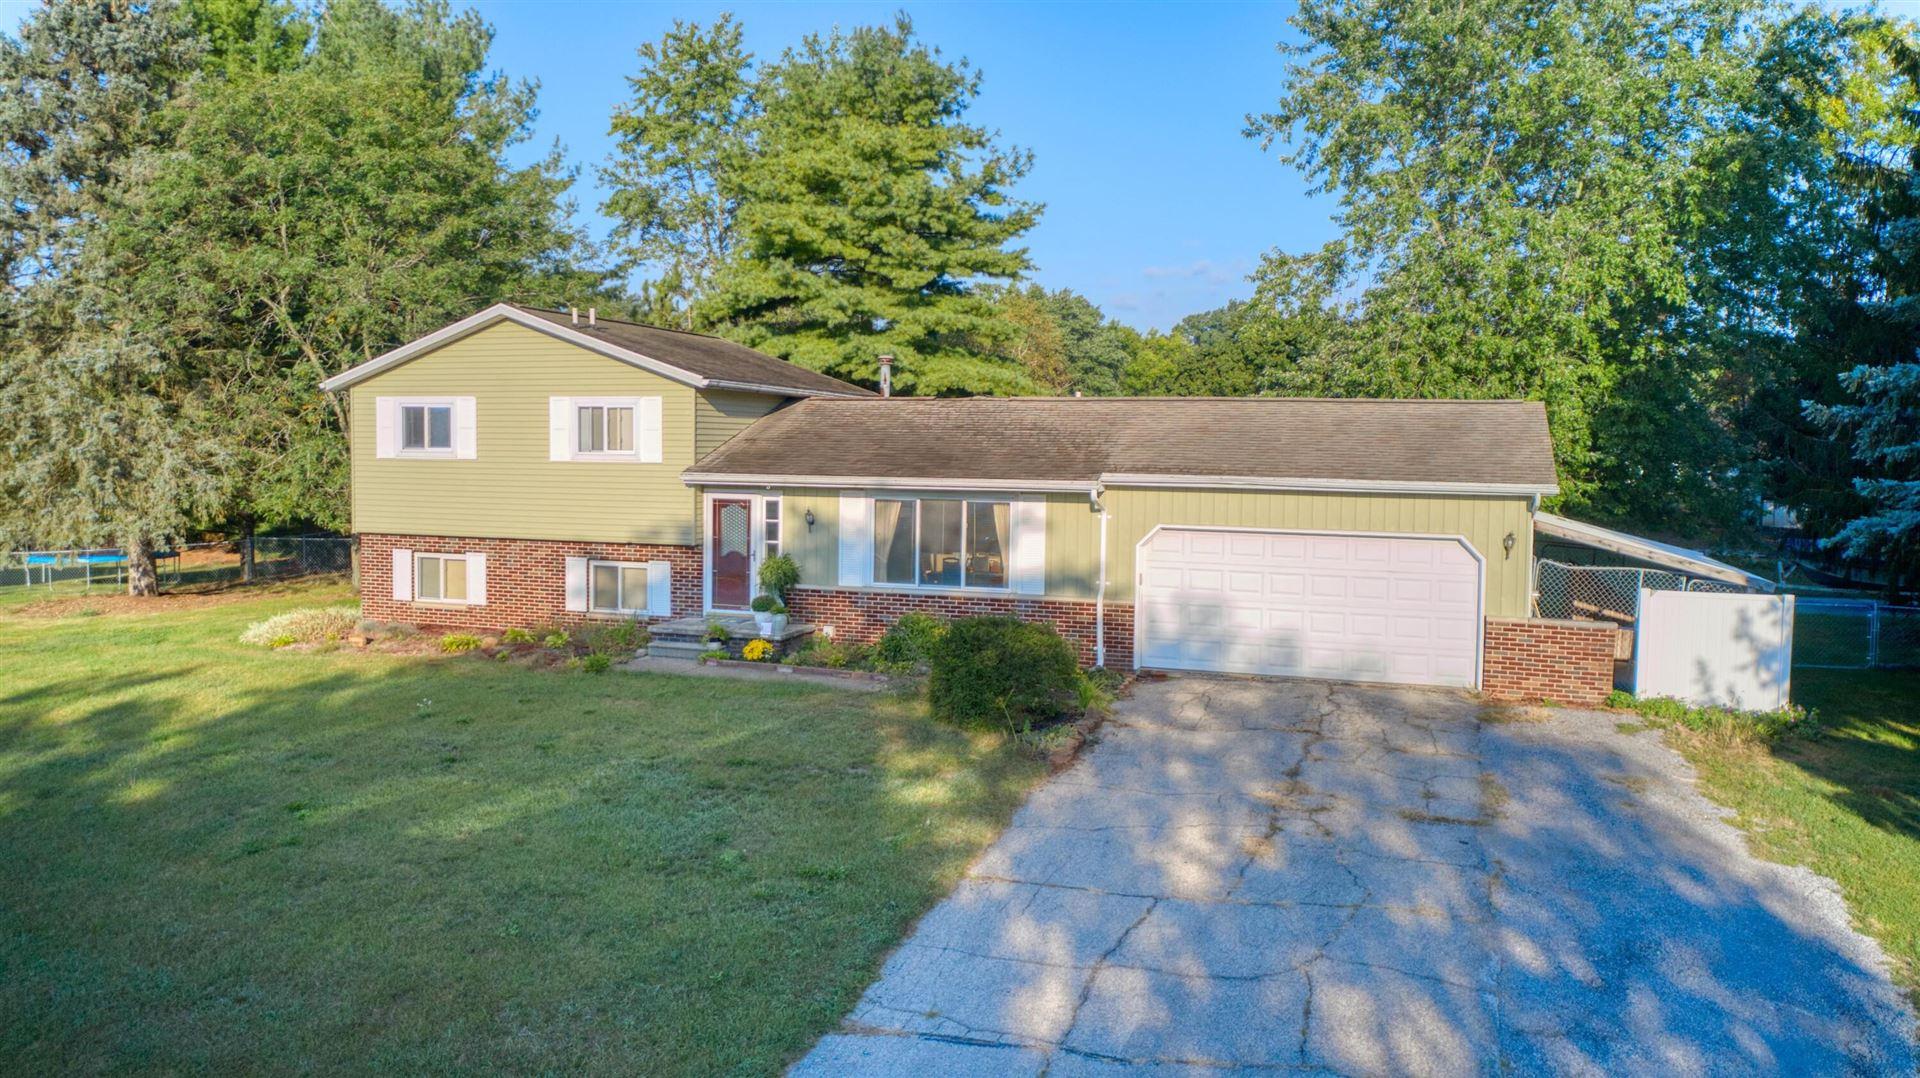 6543 Meadowlark Circle, Jackson, MI 49201 - MLS#: 21106972